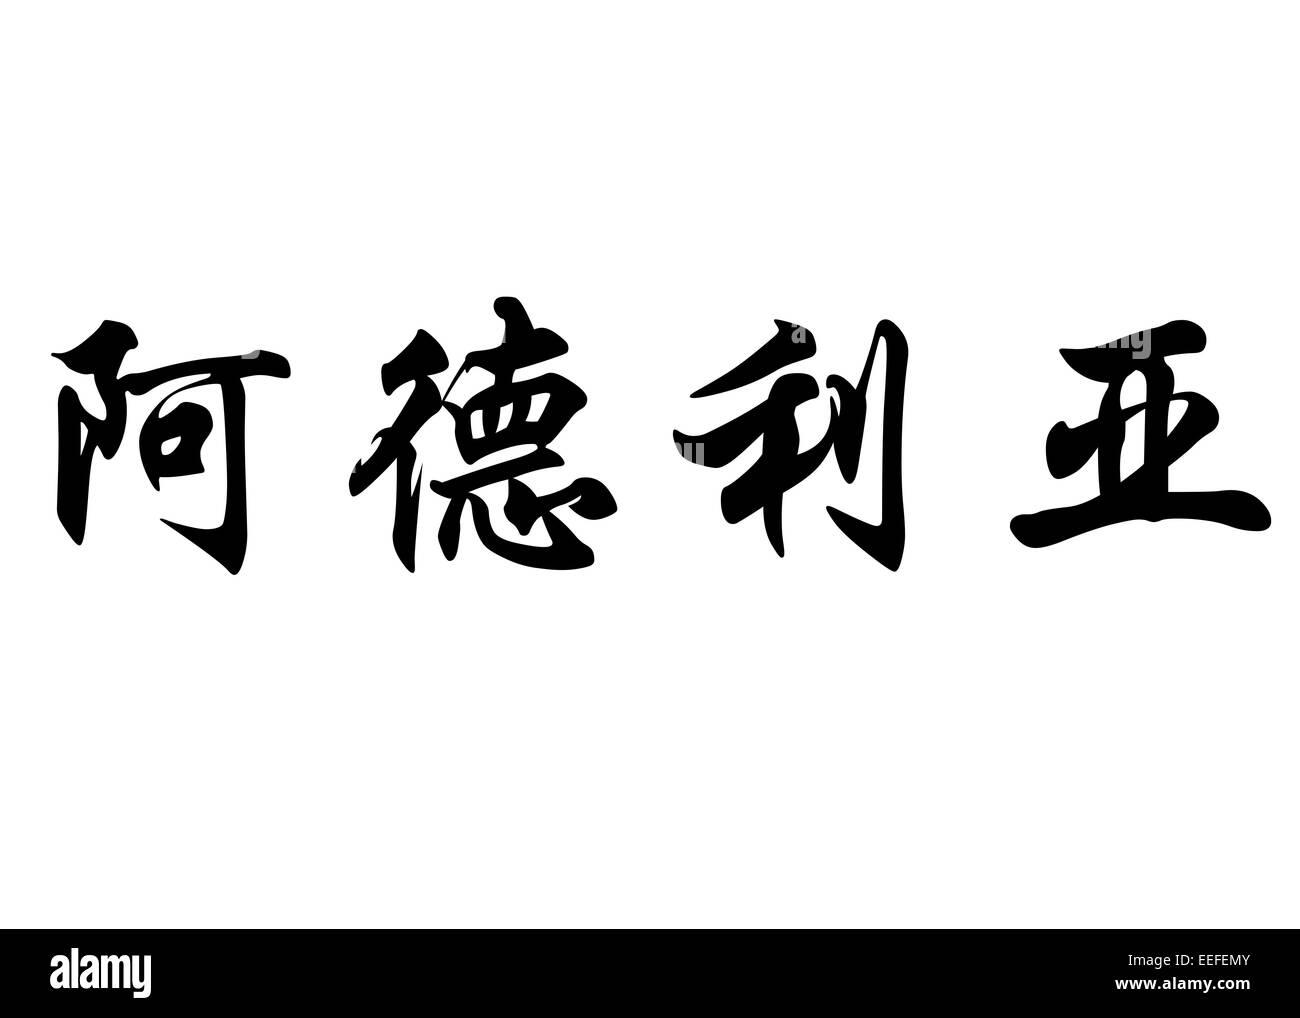 English name adria in chinese kanji calligraphy characters or stock english name adria in chinese kanji calligraphy characters or japanese characters biocorpaavc Choice Image